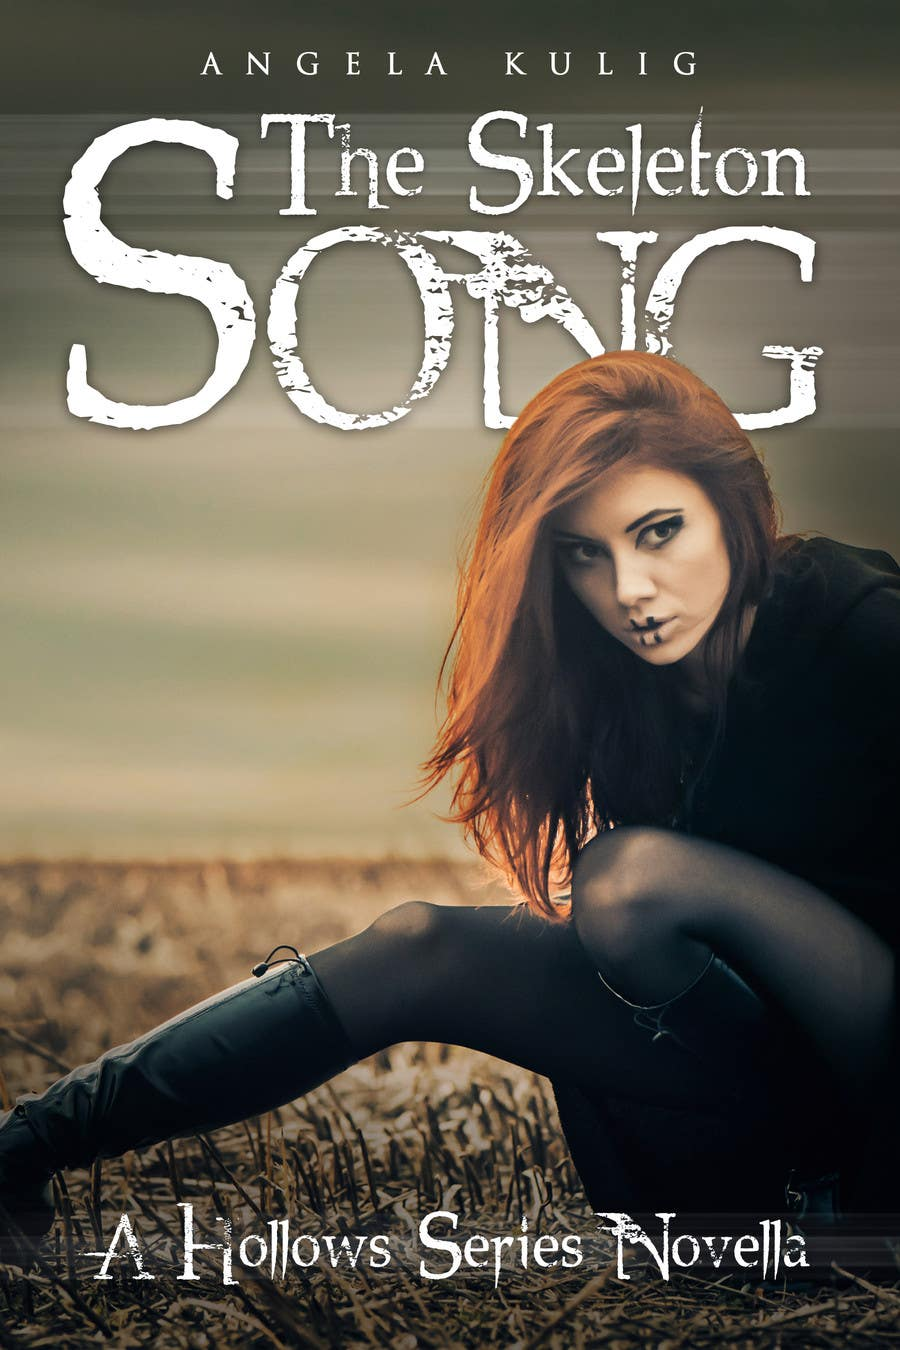 Konkurrenceindlæg #99 for The Skeleton Song New Cover